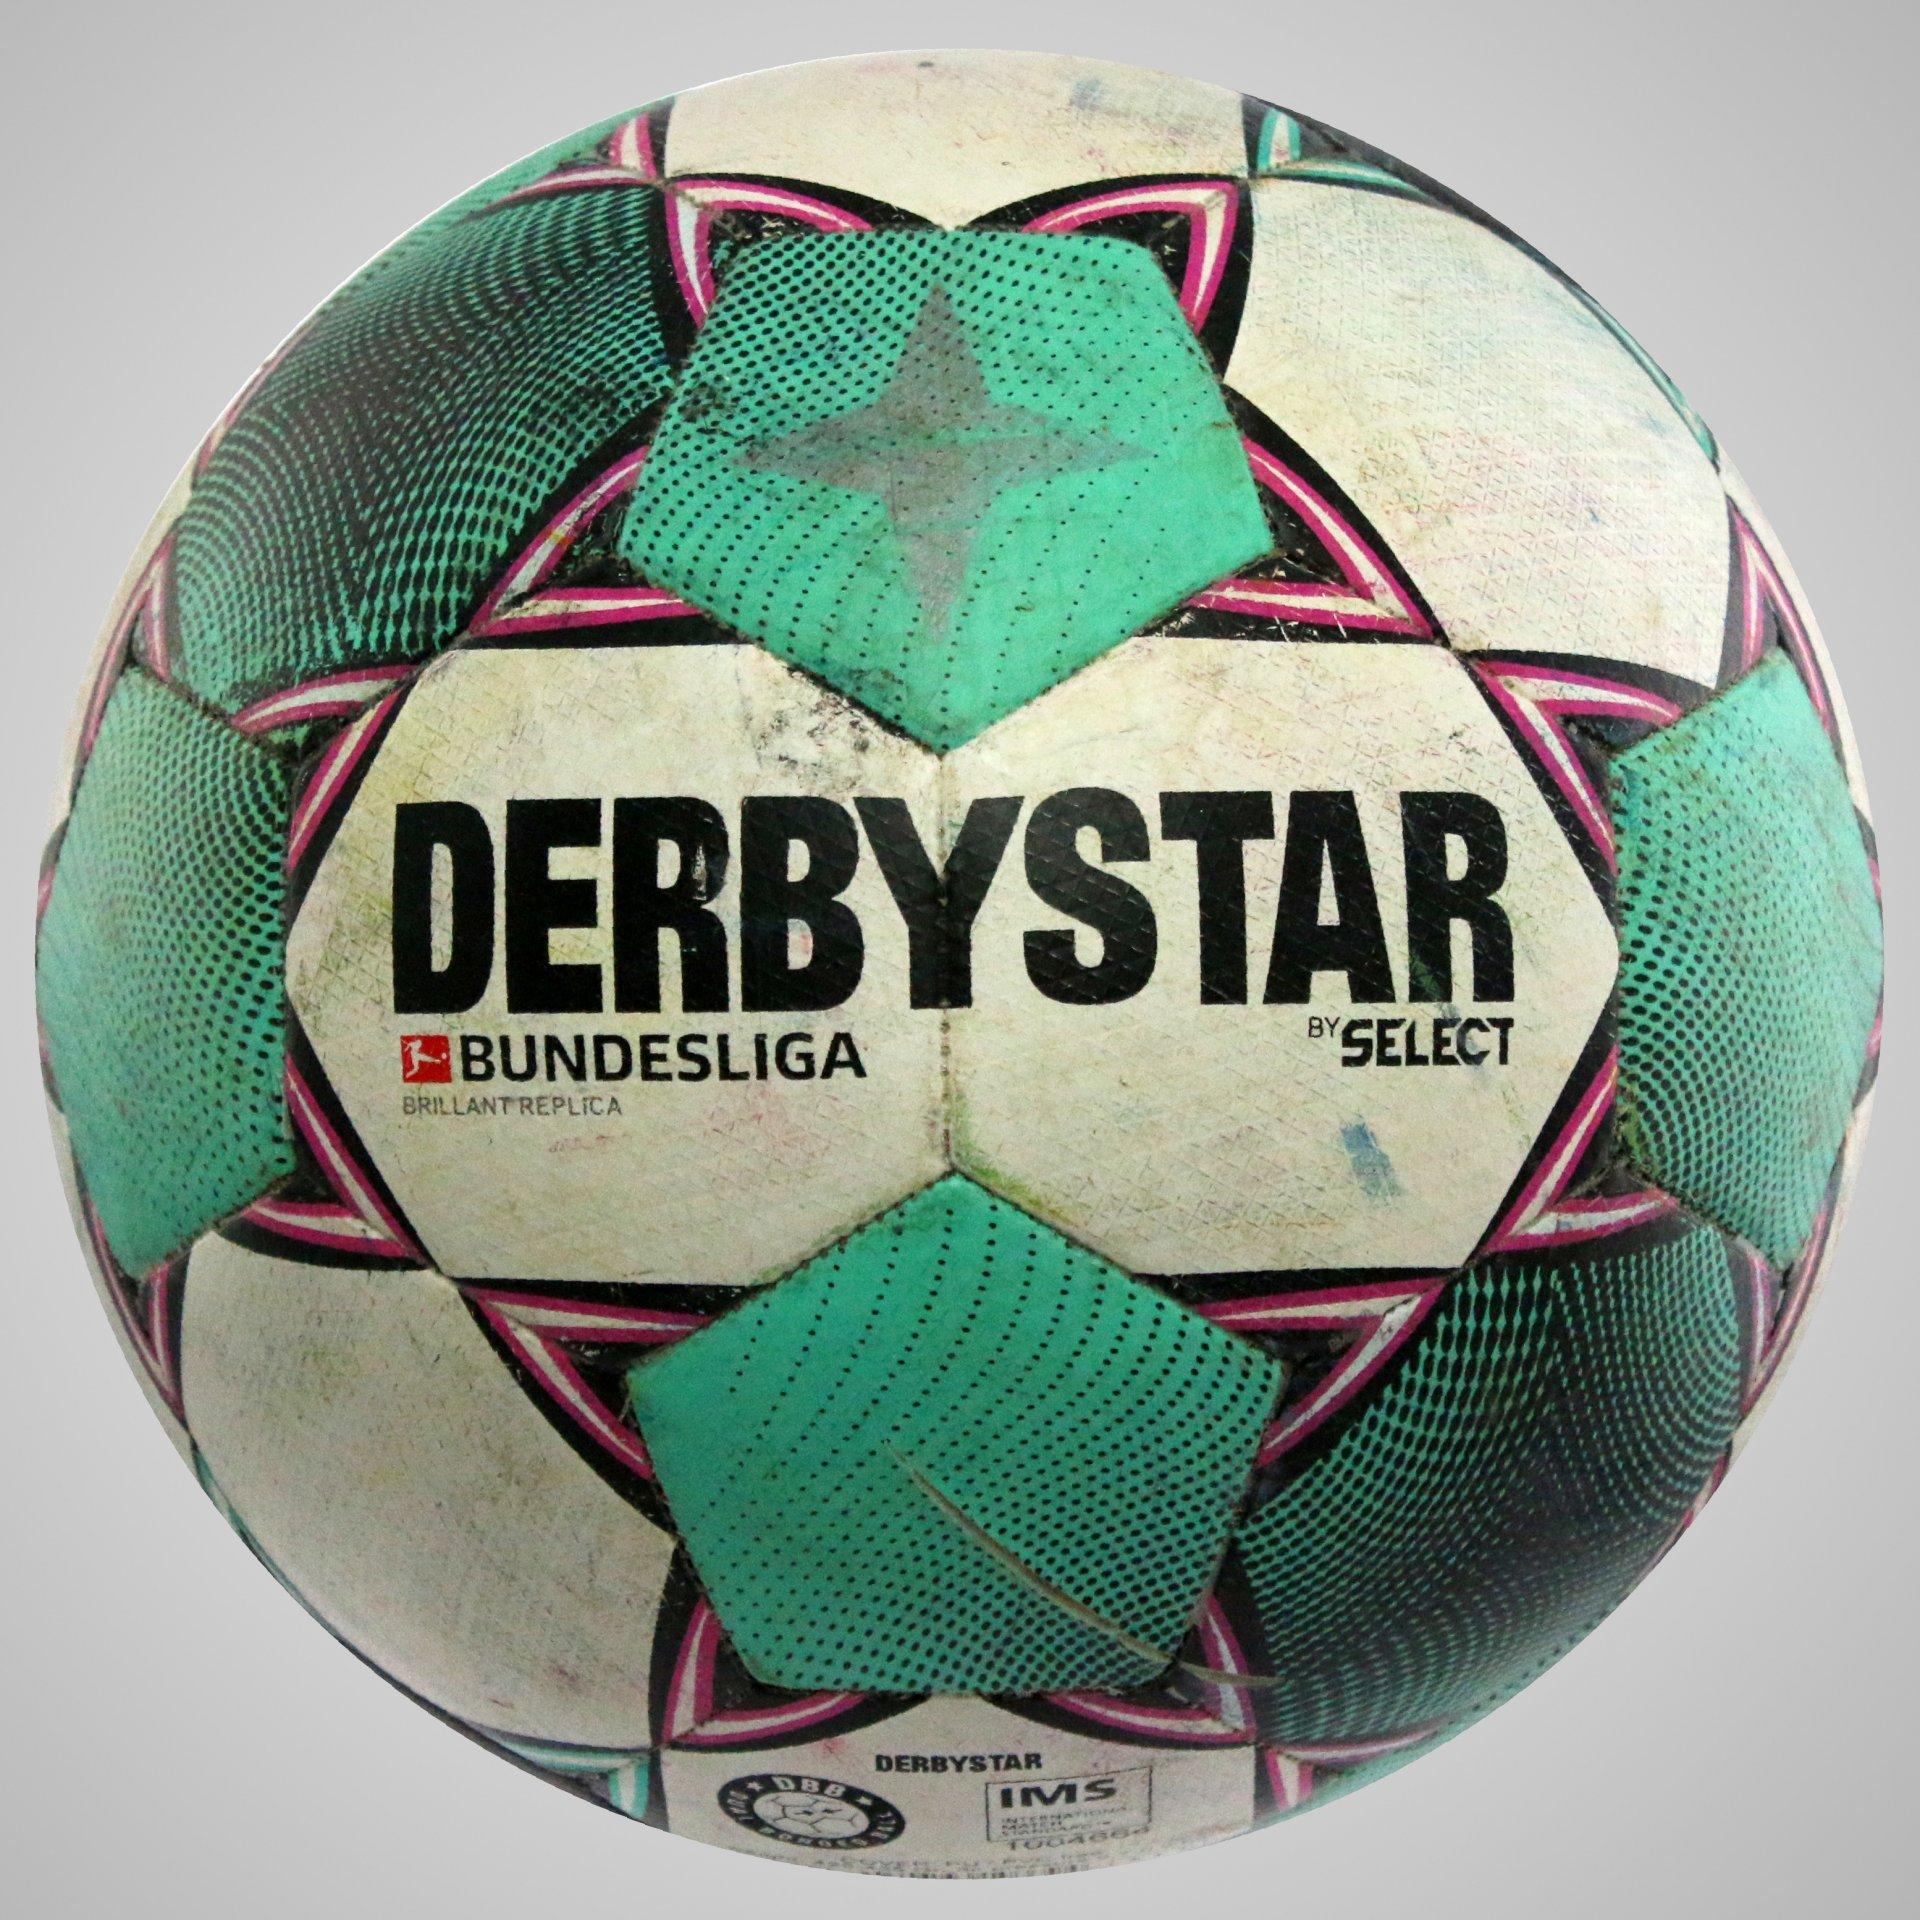 Derbystar Bundesliga Brilliant Replica 2020